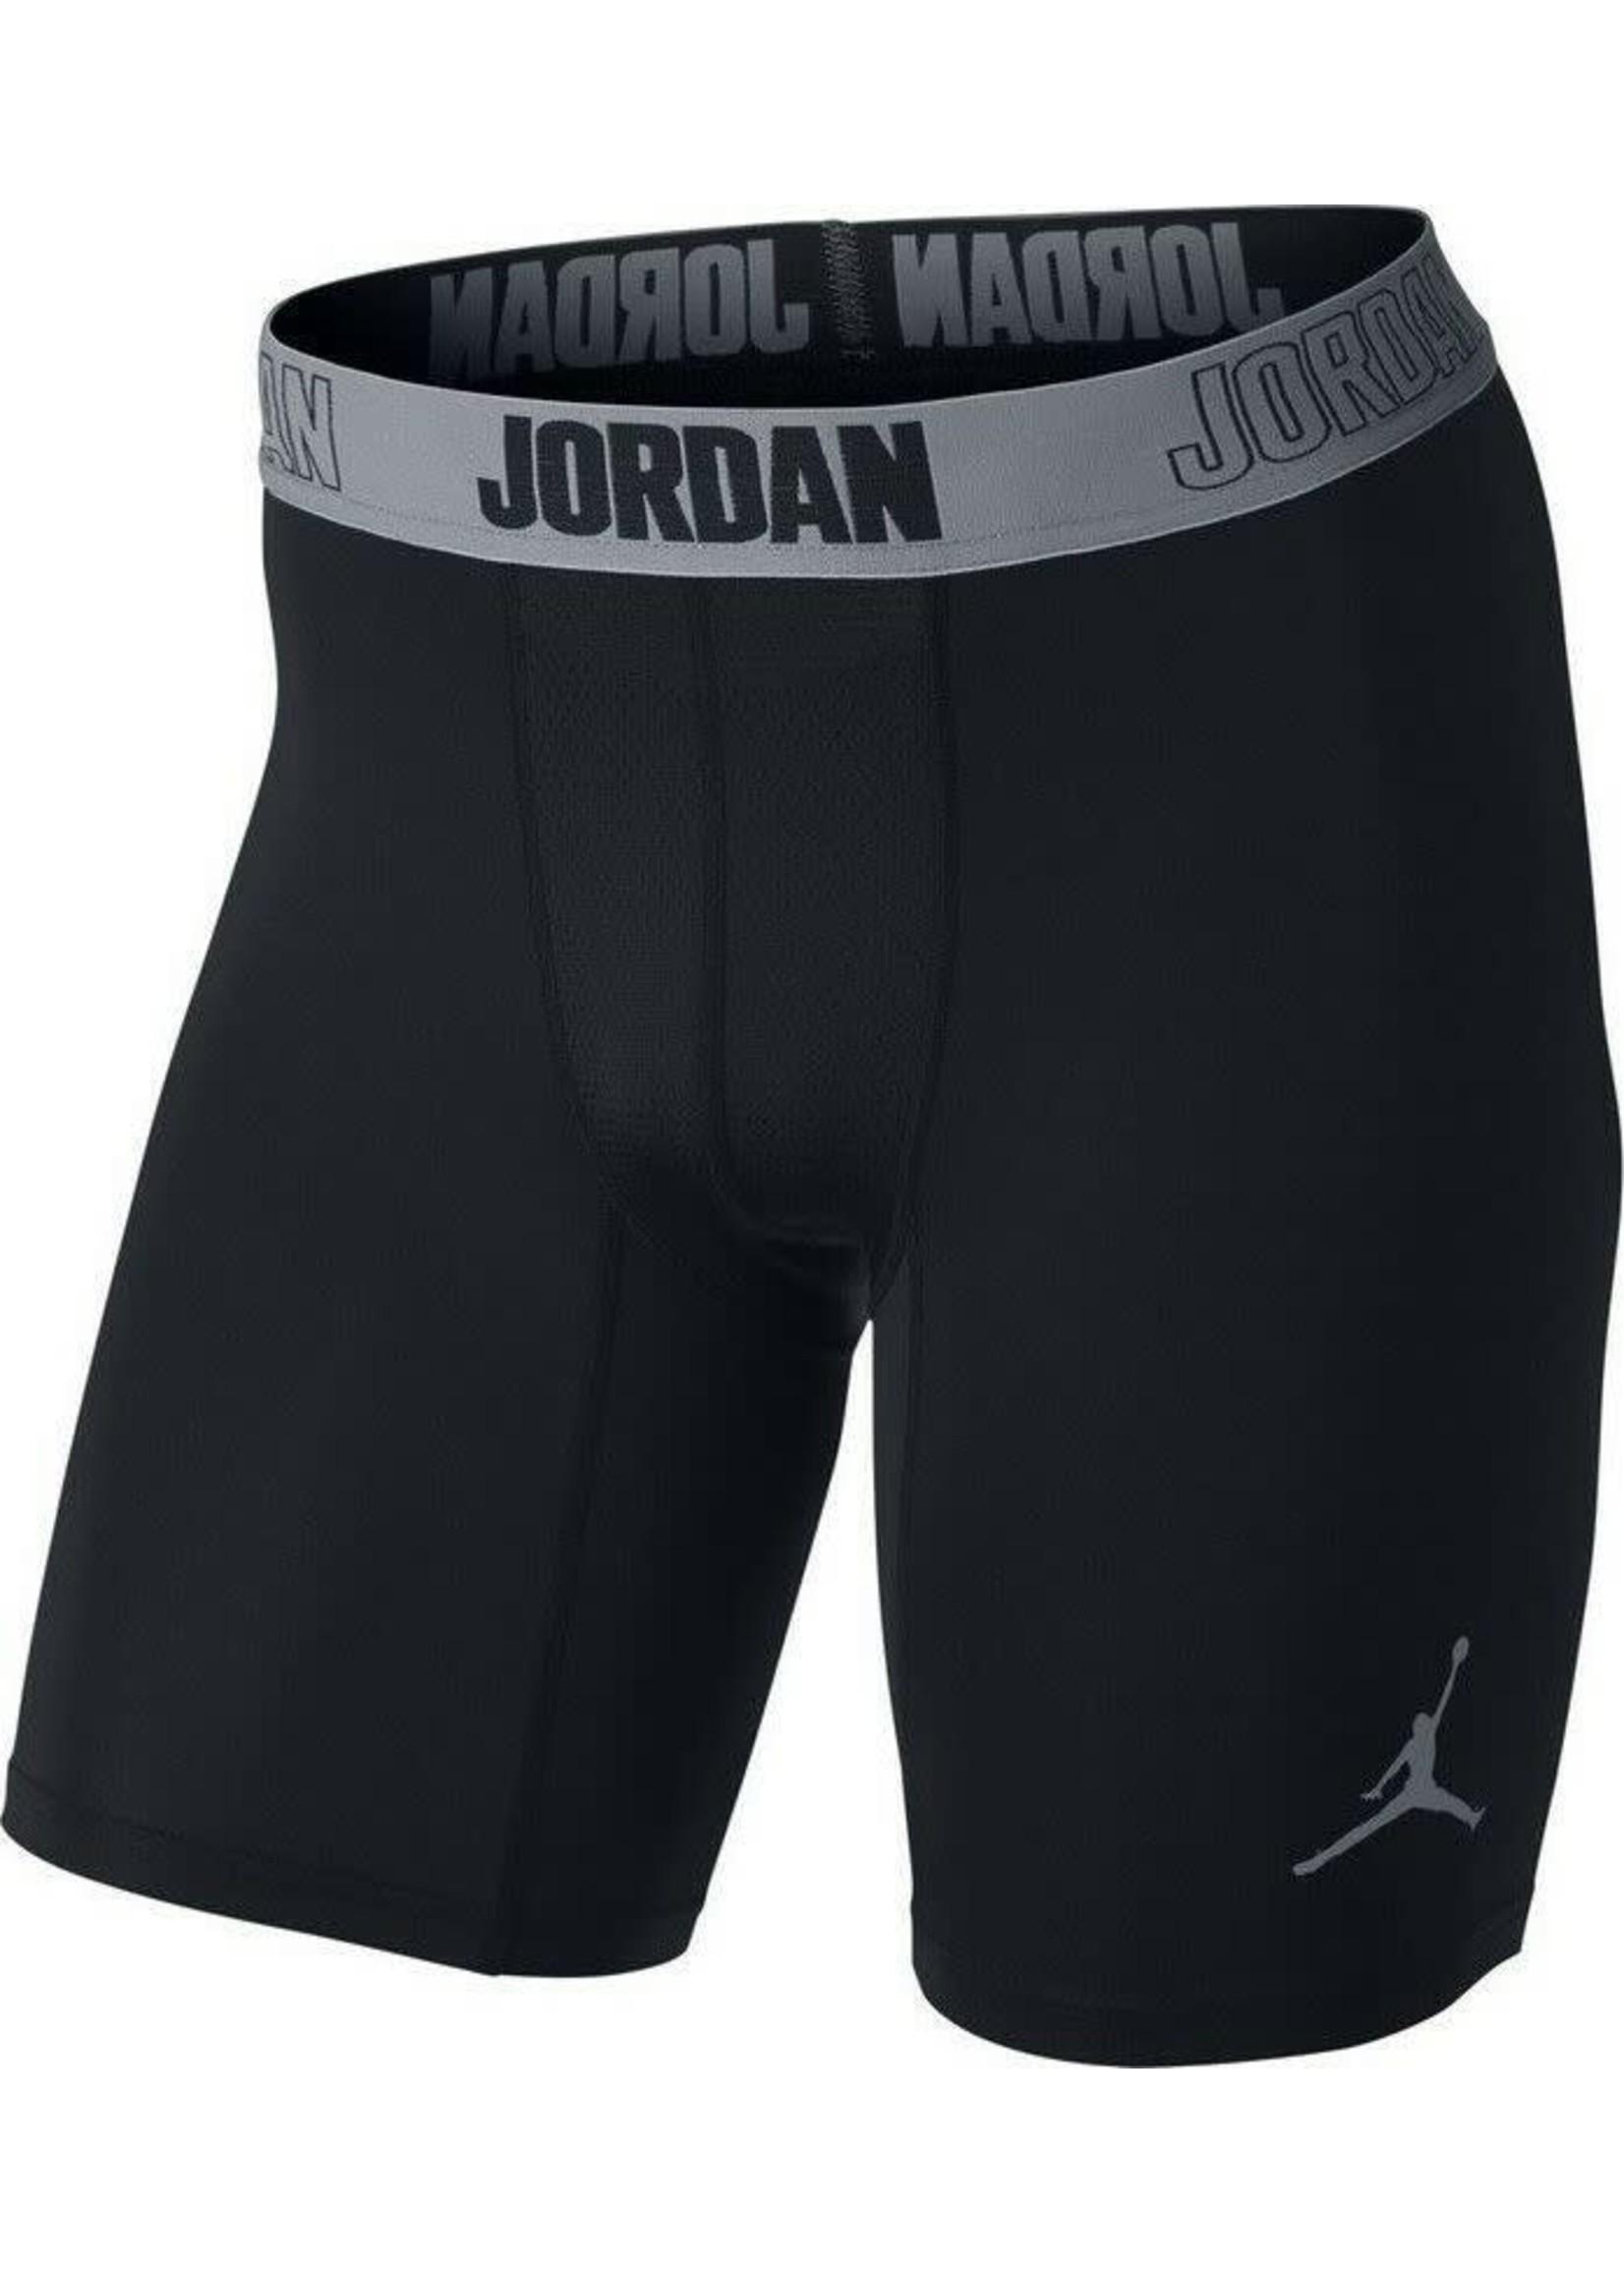 Nike Jordan Alpha Compression Shorts